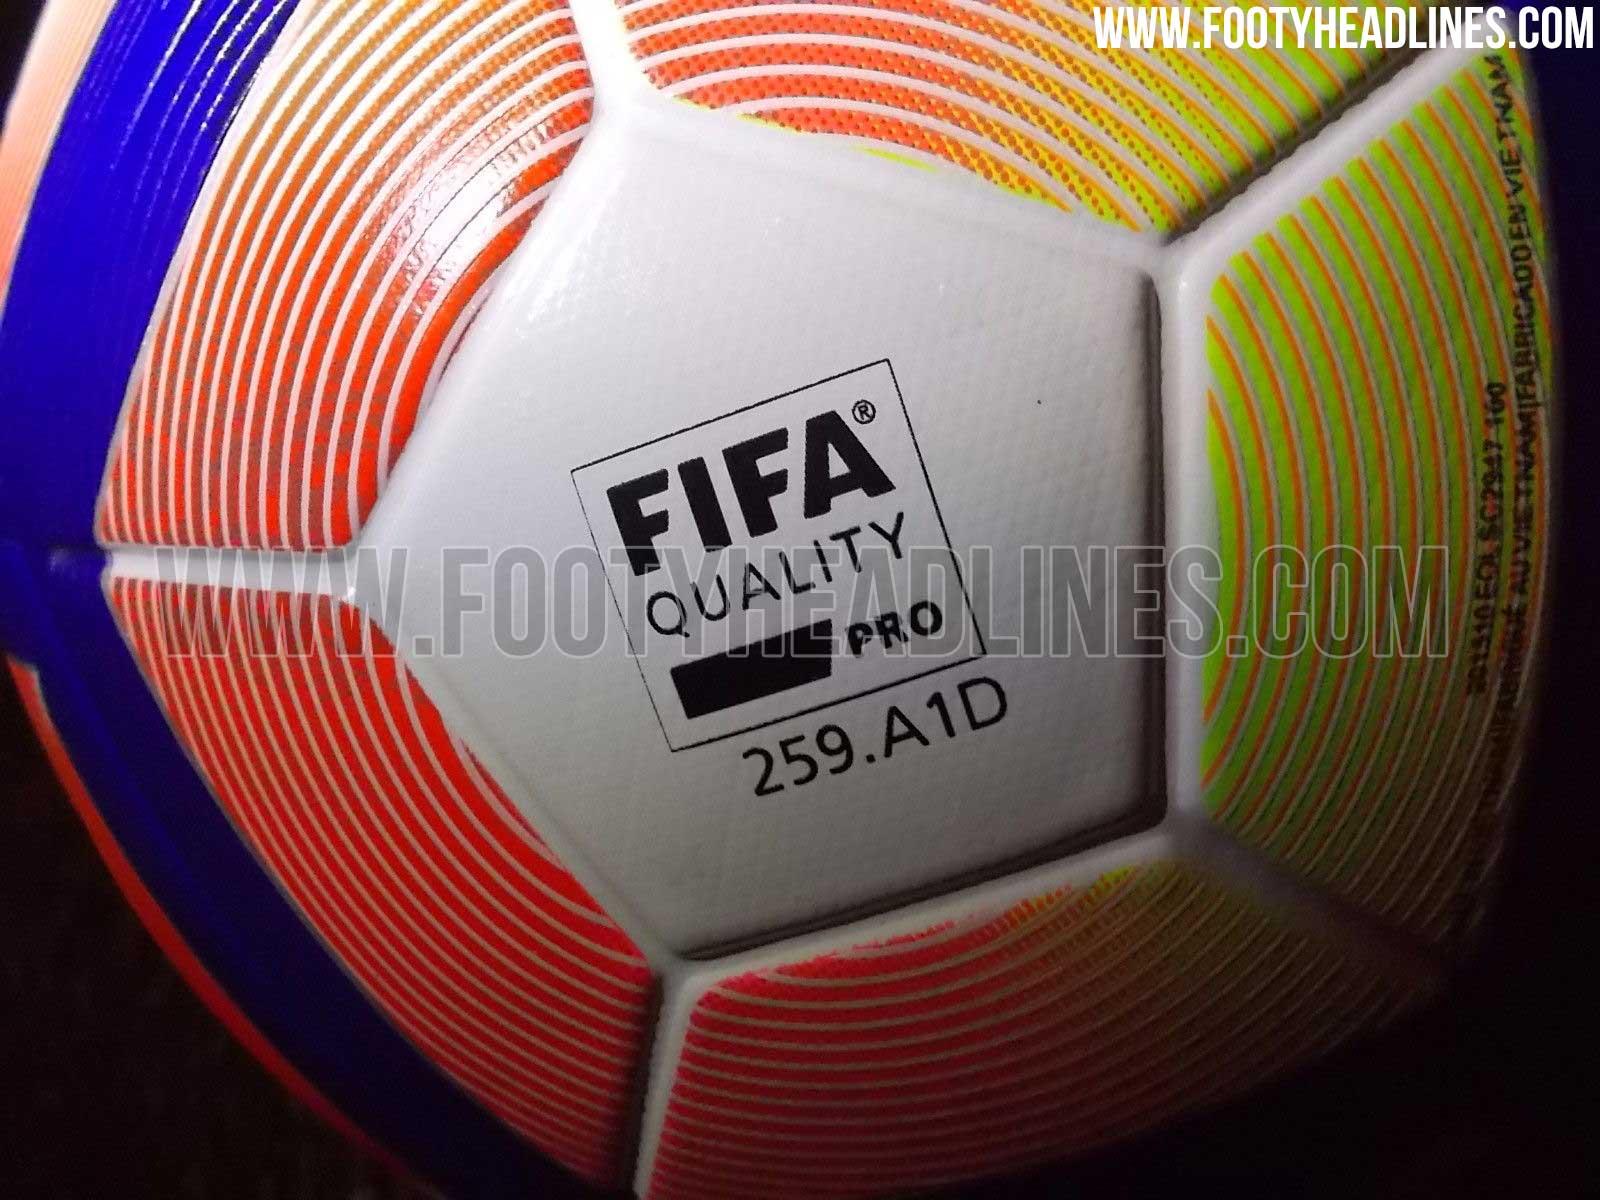 La Liga: Nike 16-17 La Liga Ball Revealed + New Ball Deal Announced